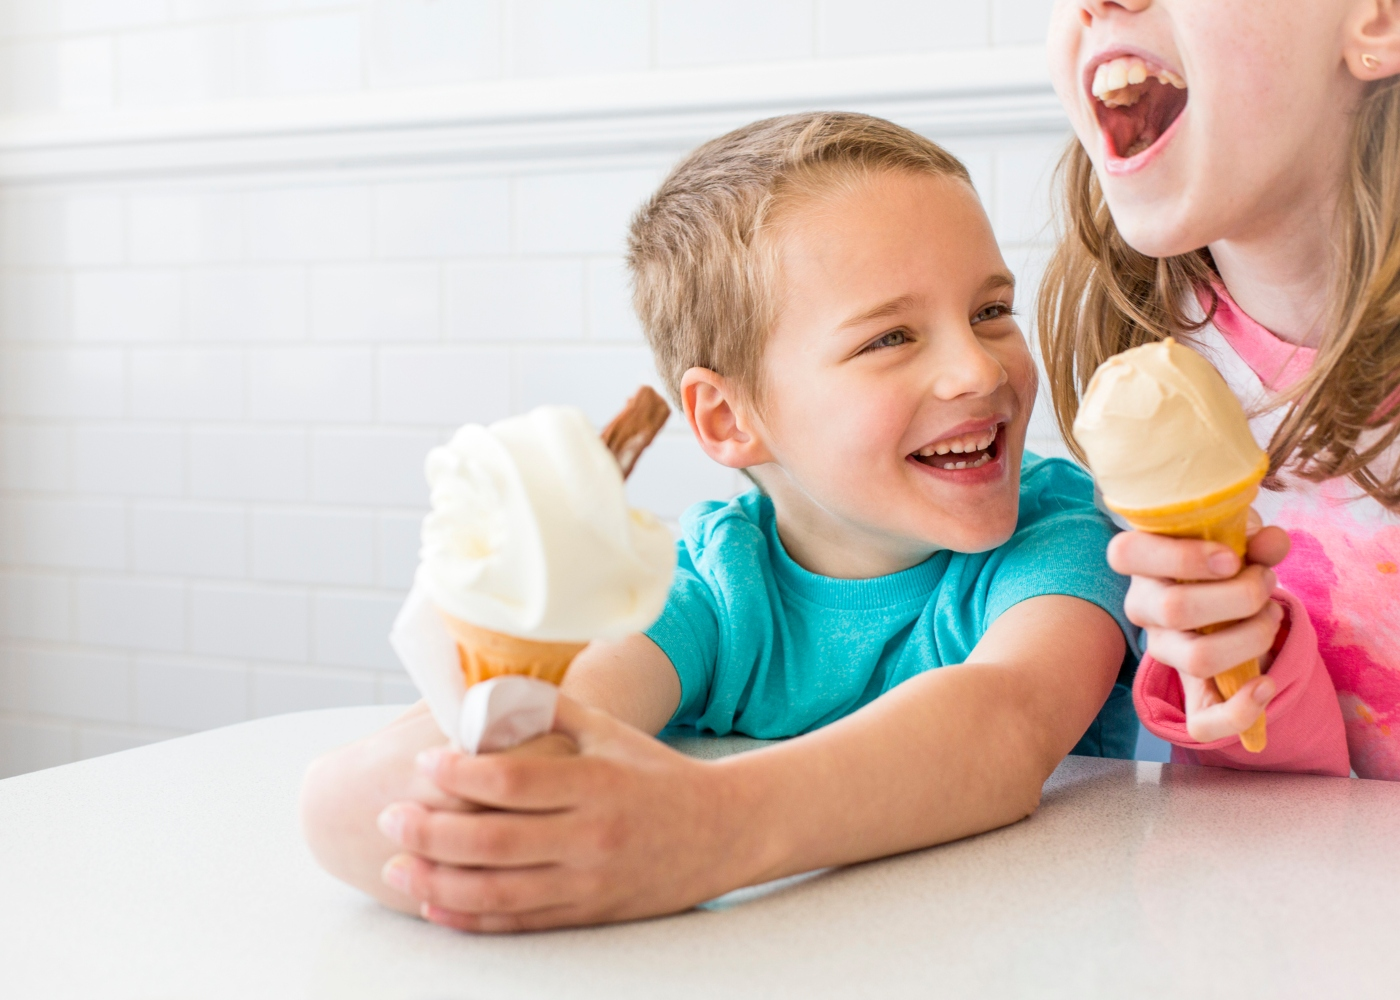 menino e menina a comer gelado